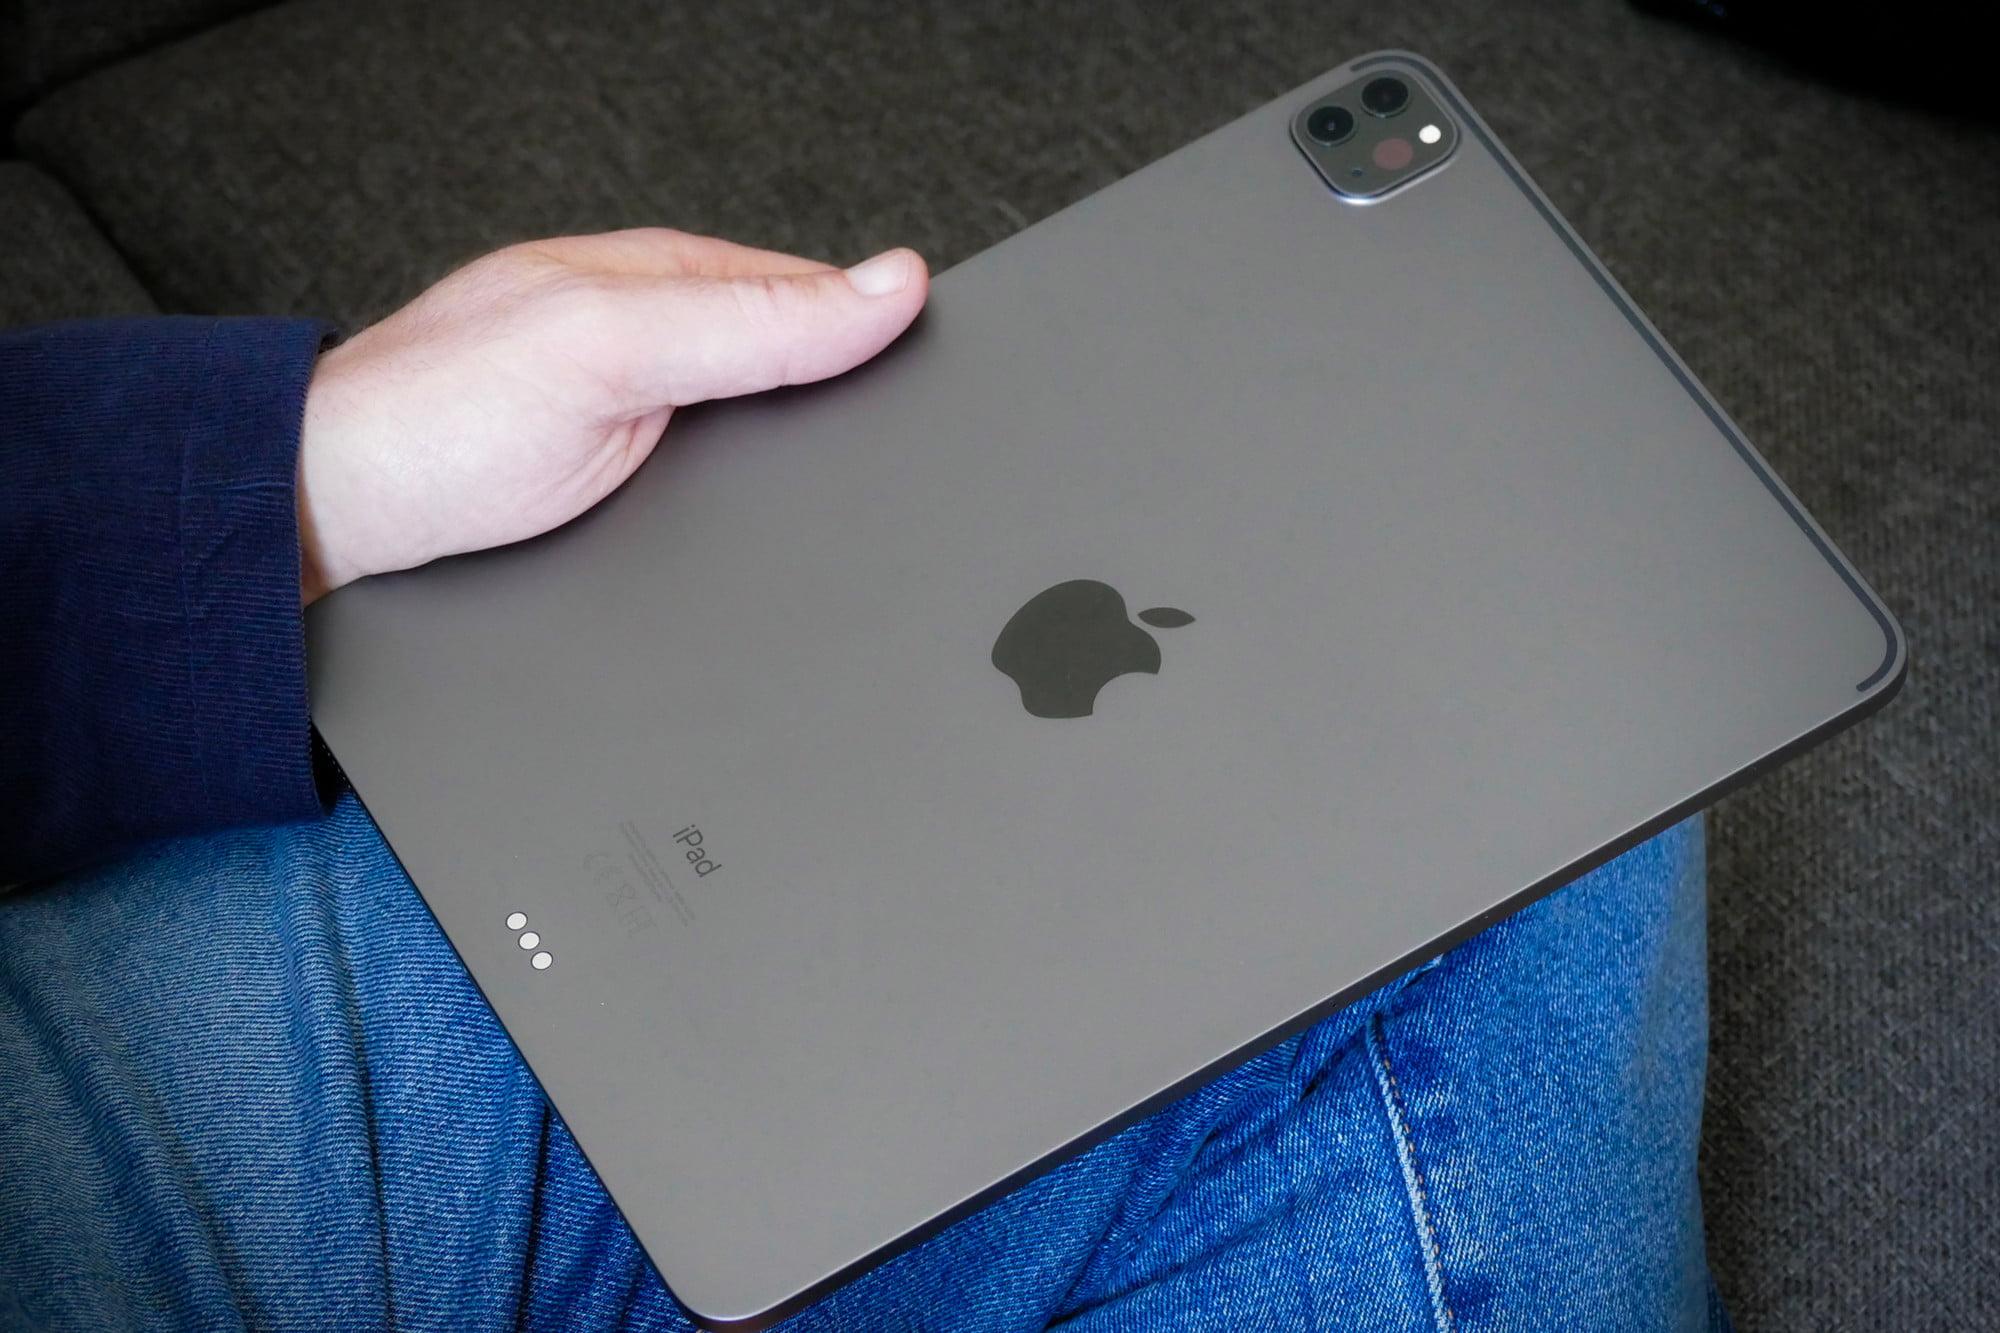 Ipad Pro Release Date 2021 - Apple To Release Ipad Pro ...